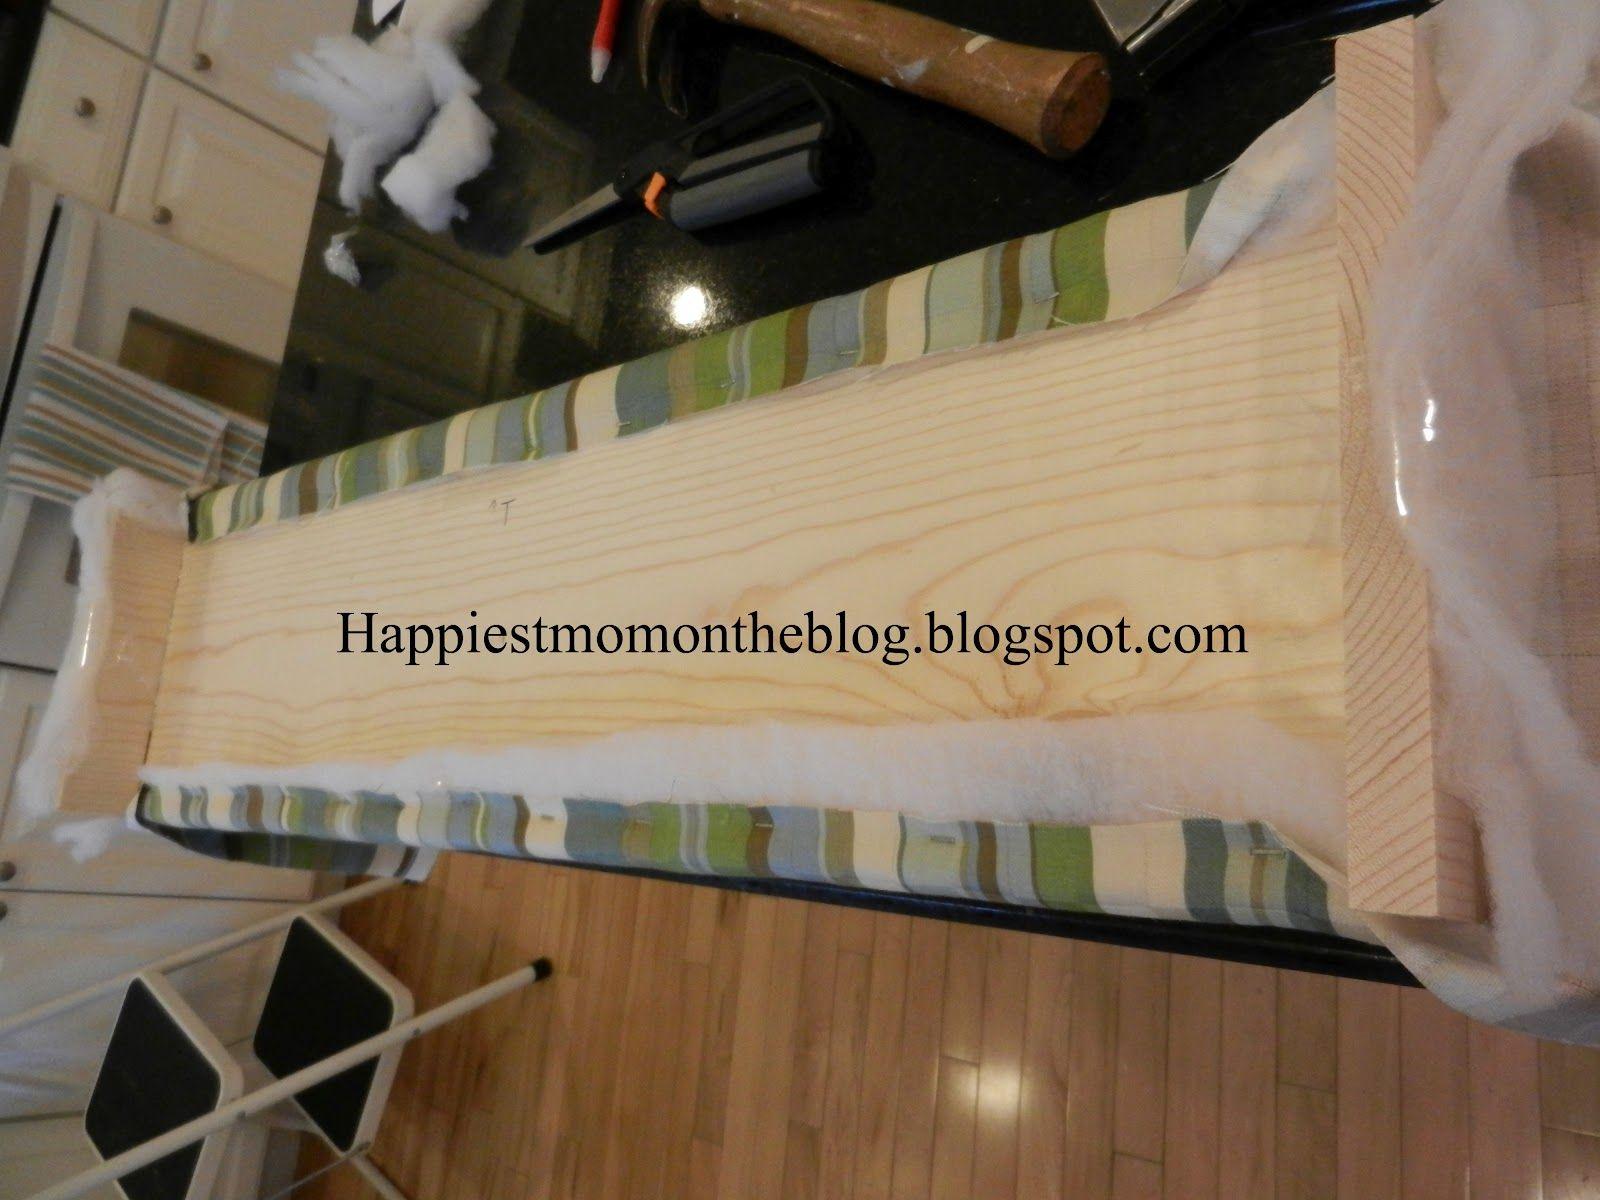 Diy Wood Cornice Diy Pelmet Boxes Aka Cornice Boards Happiestmomontheblog